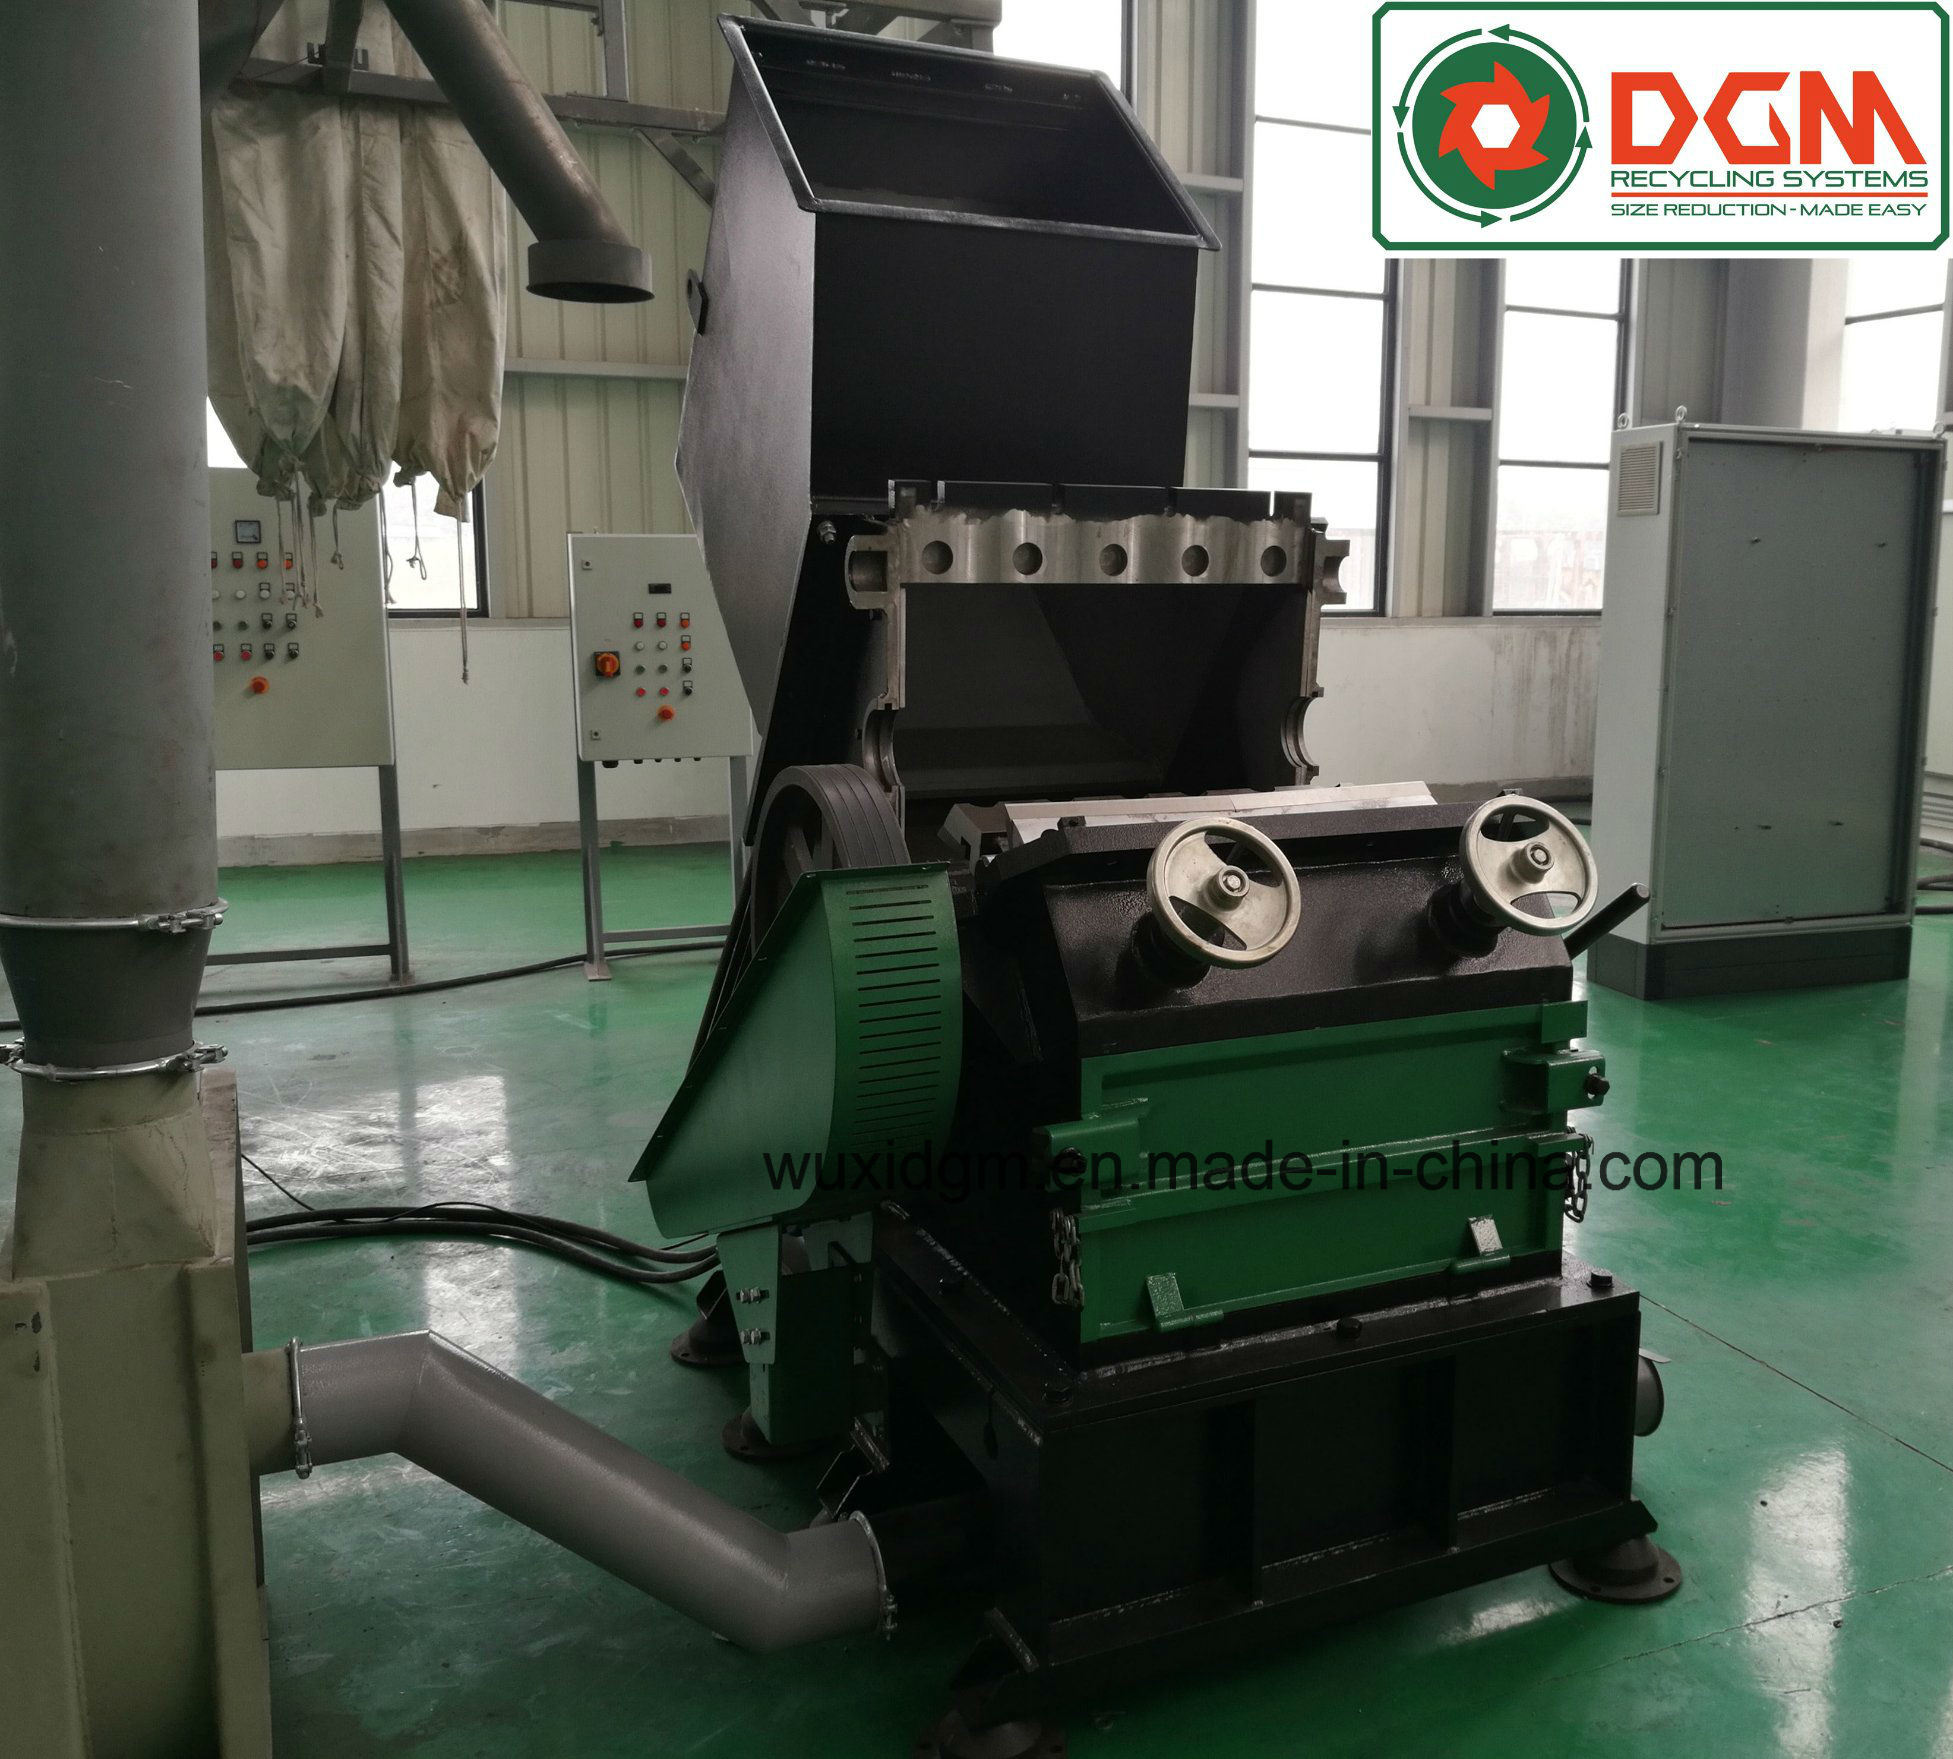 Dge5001000 Economical Granulator Increase Value of Your Materials